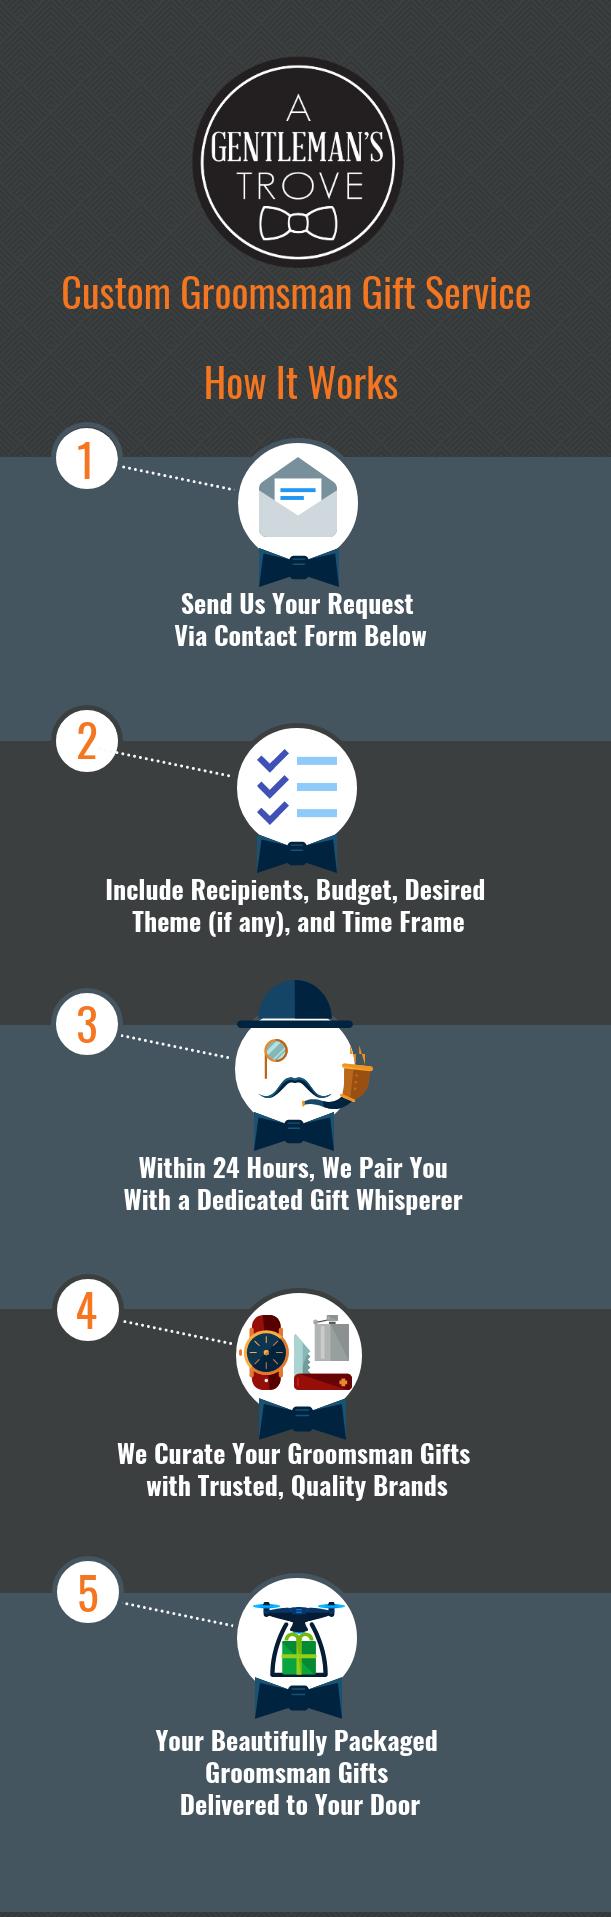 groomsman-gift-service2-1.png